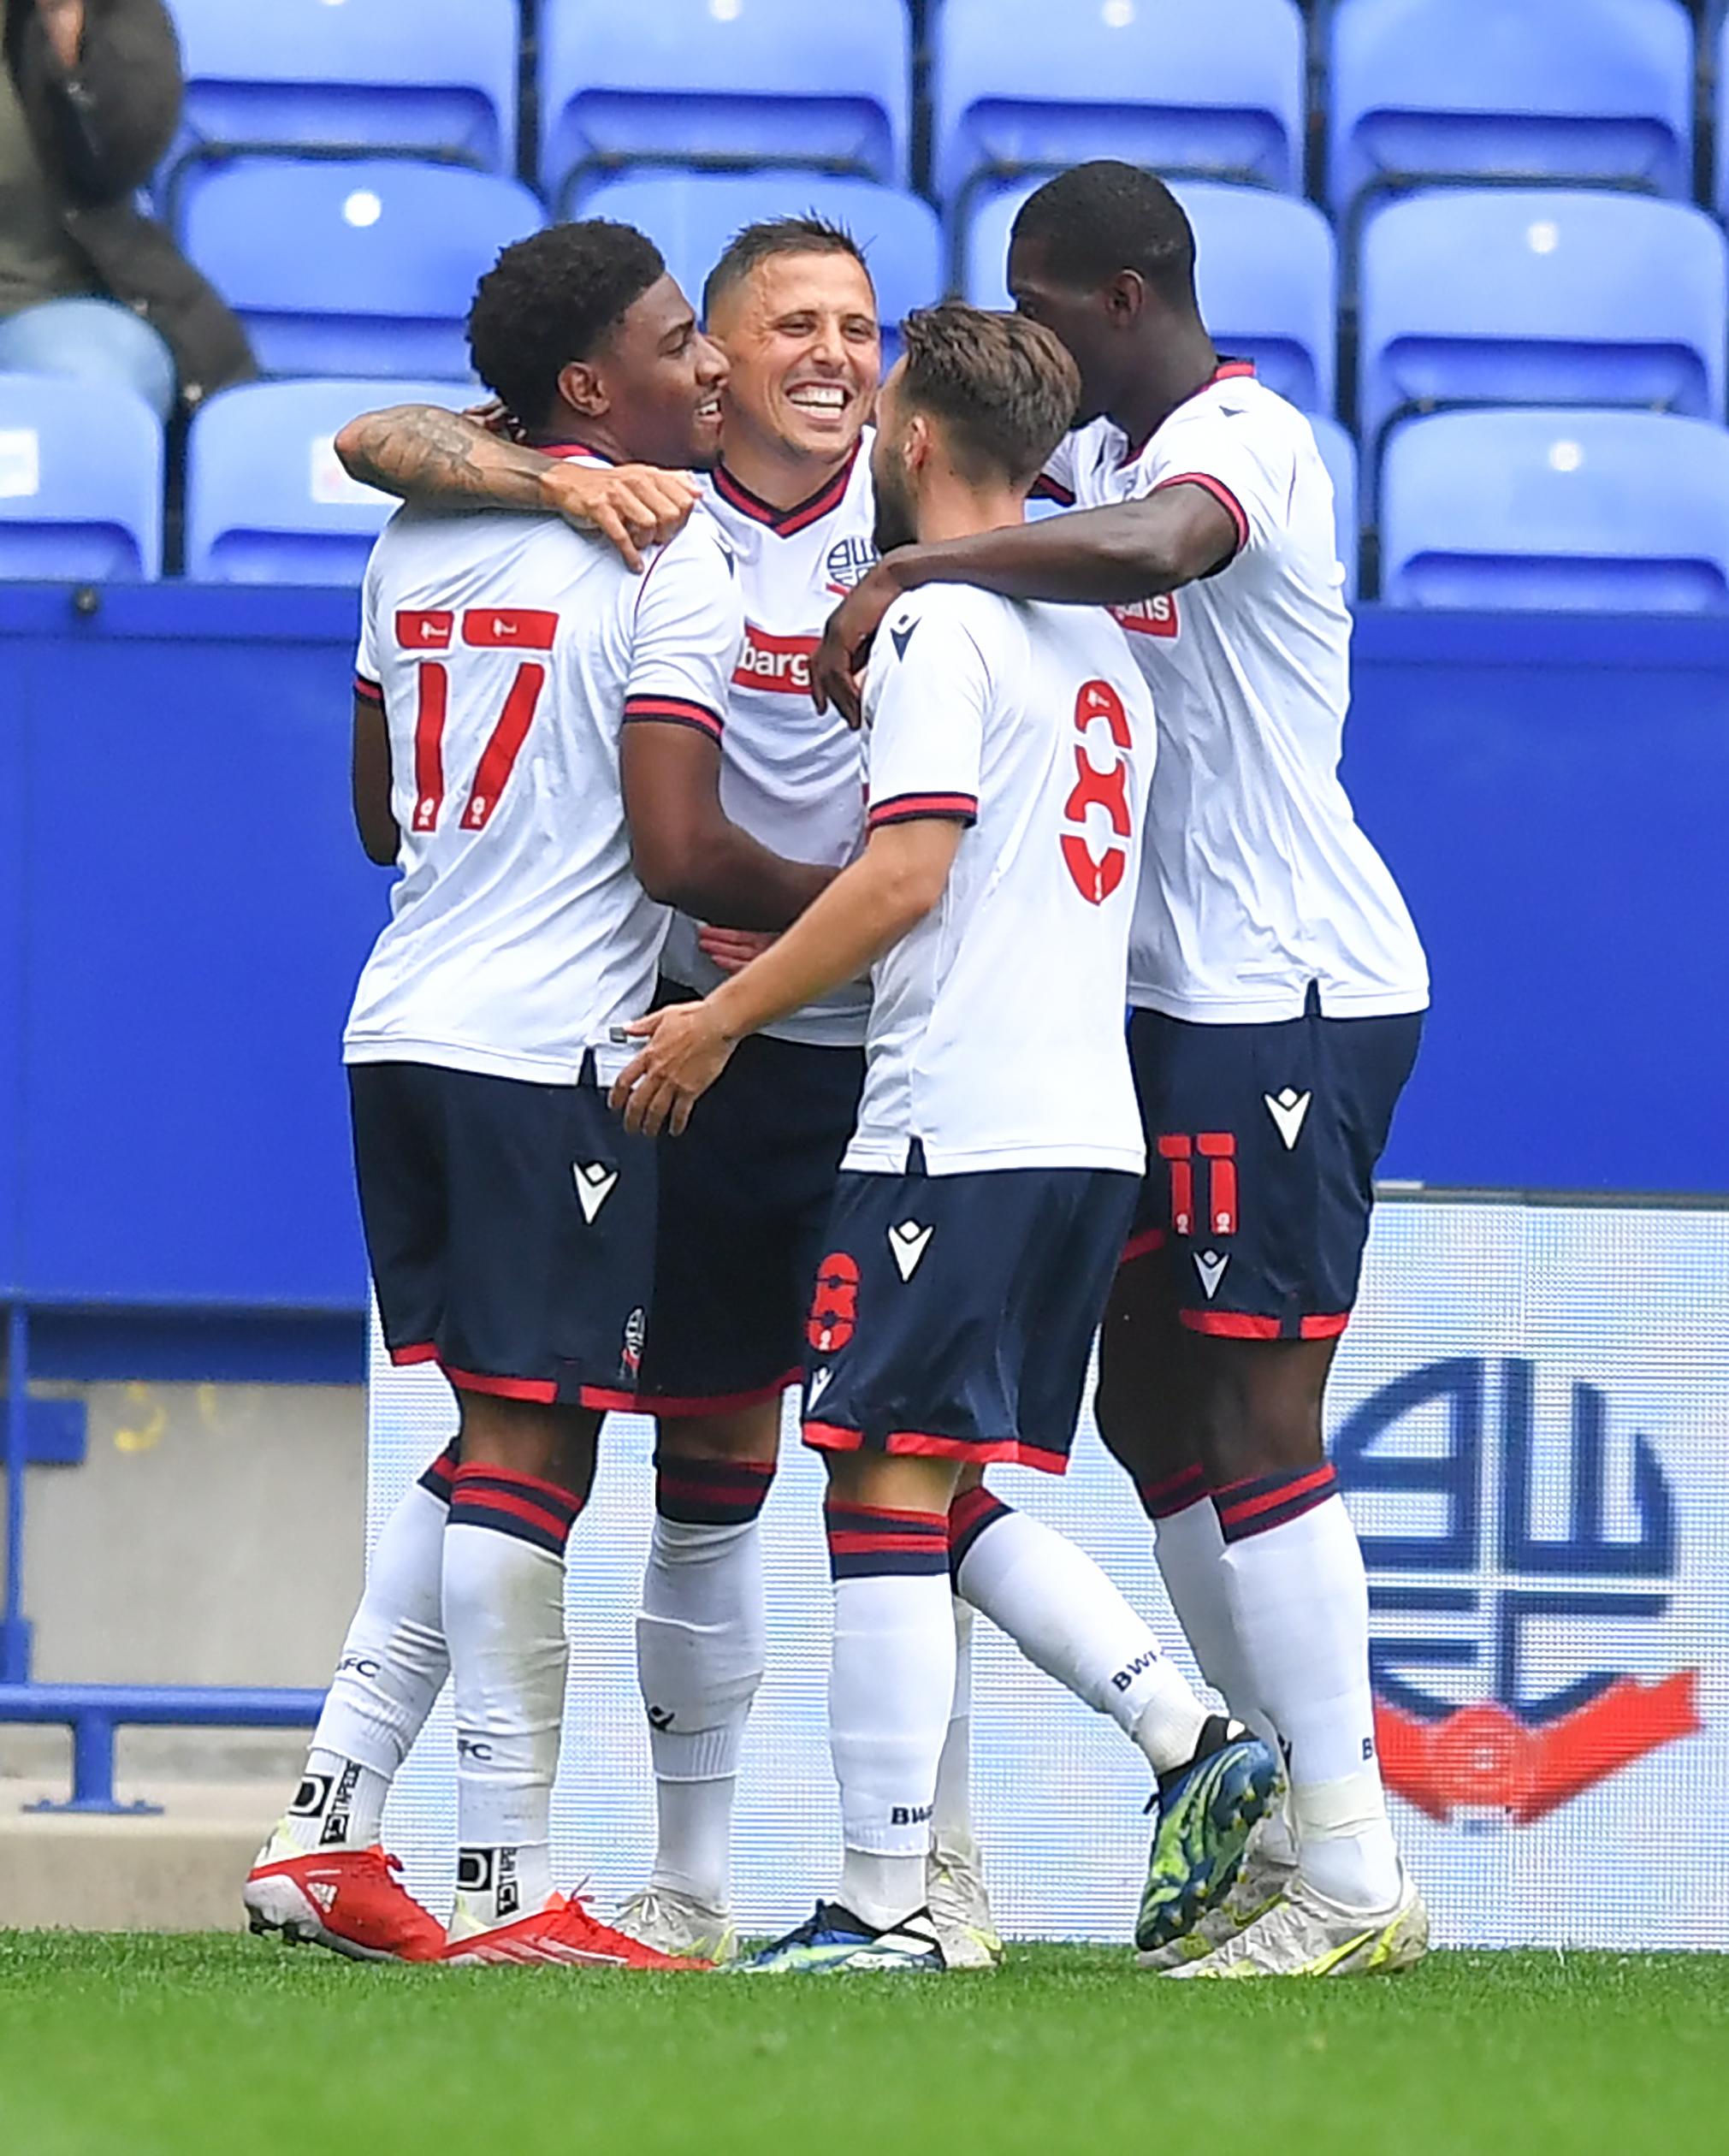 Bolton Wanderers v Blackburn Rovers - Pre-Season Friendly